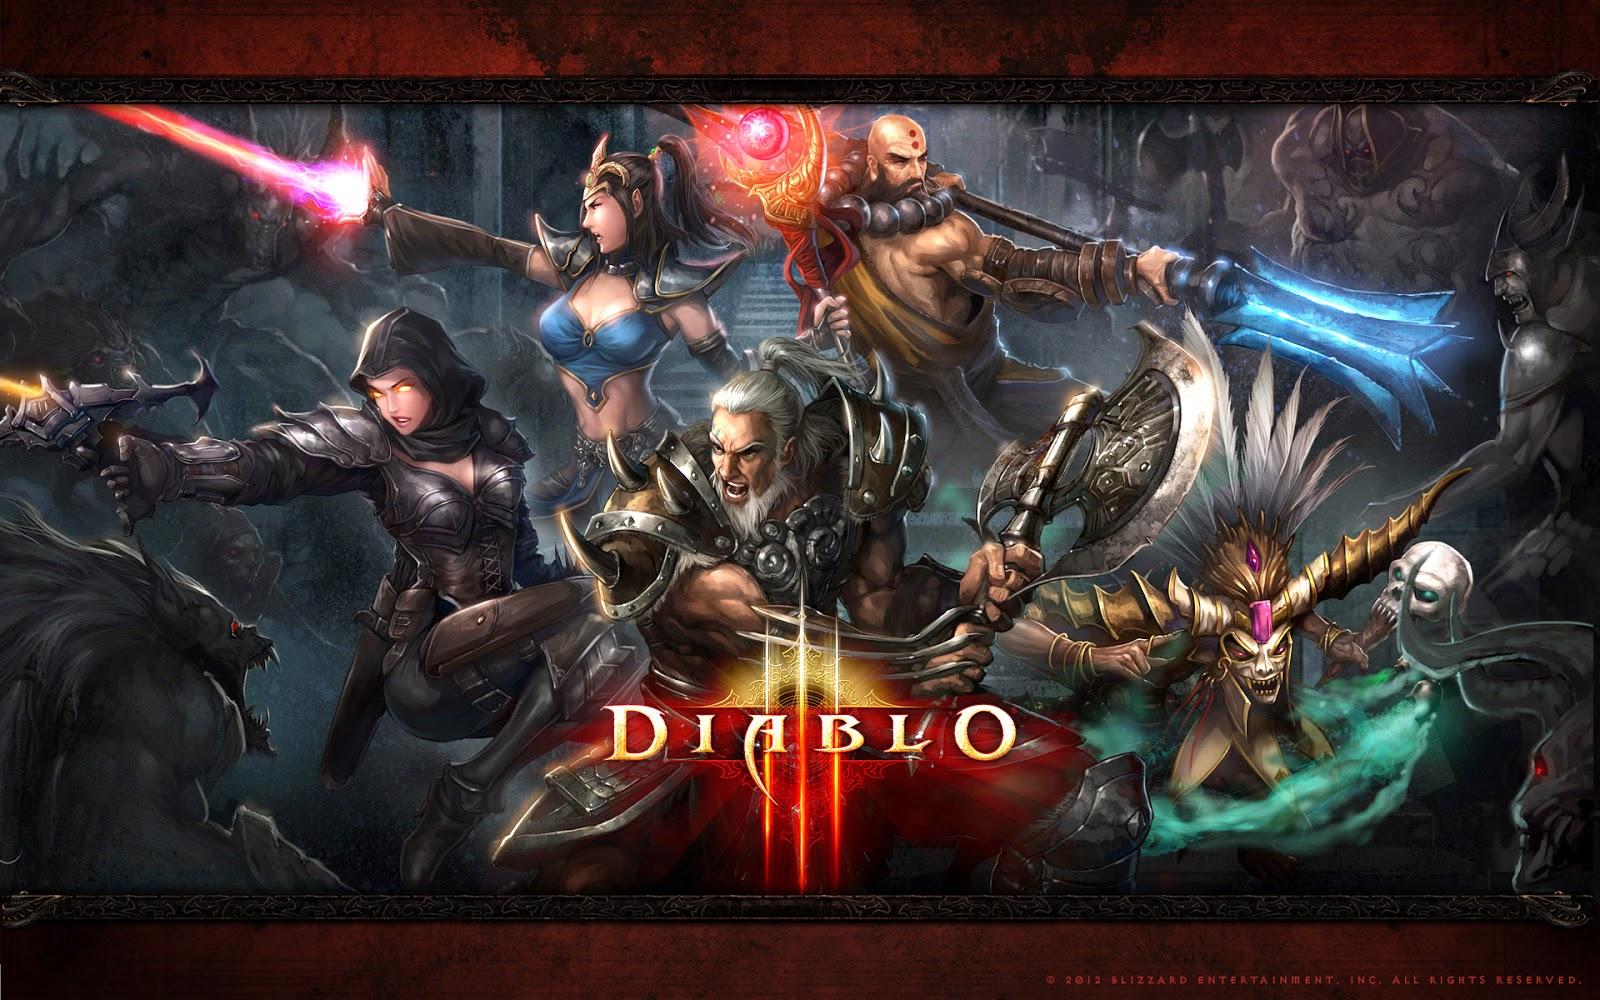 تحميل لعبة Diablo III: Ultimate Evil Edition نسخة PS2 - تحميل مباشر